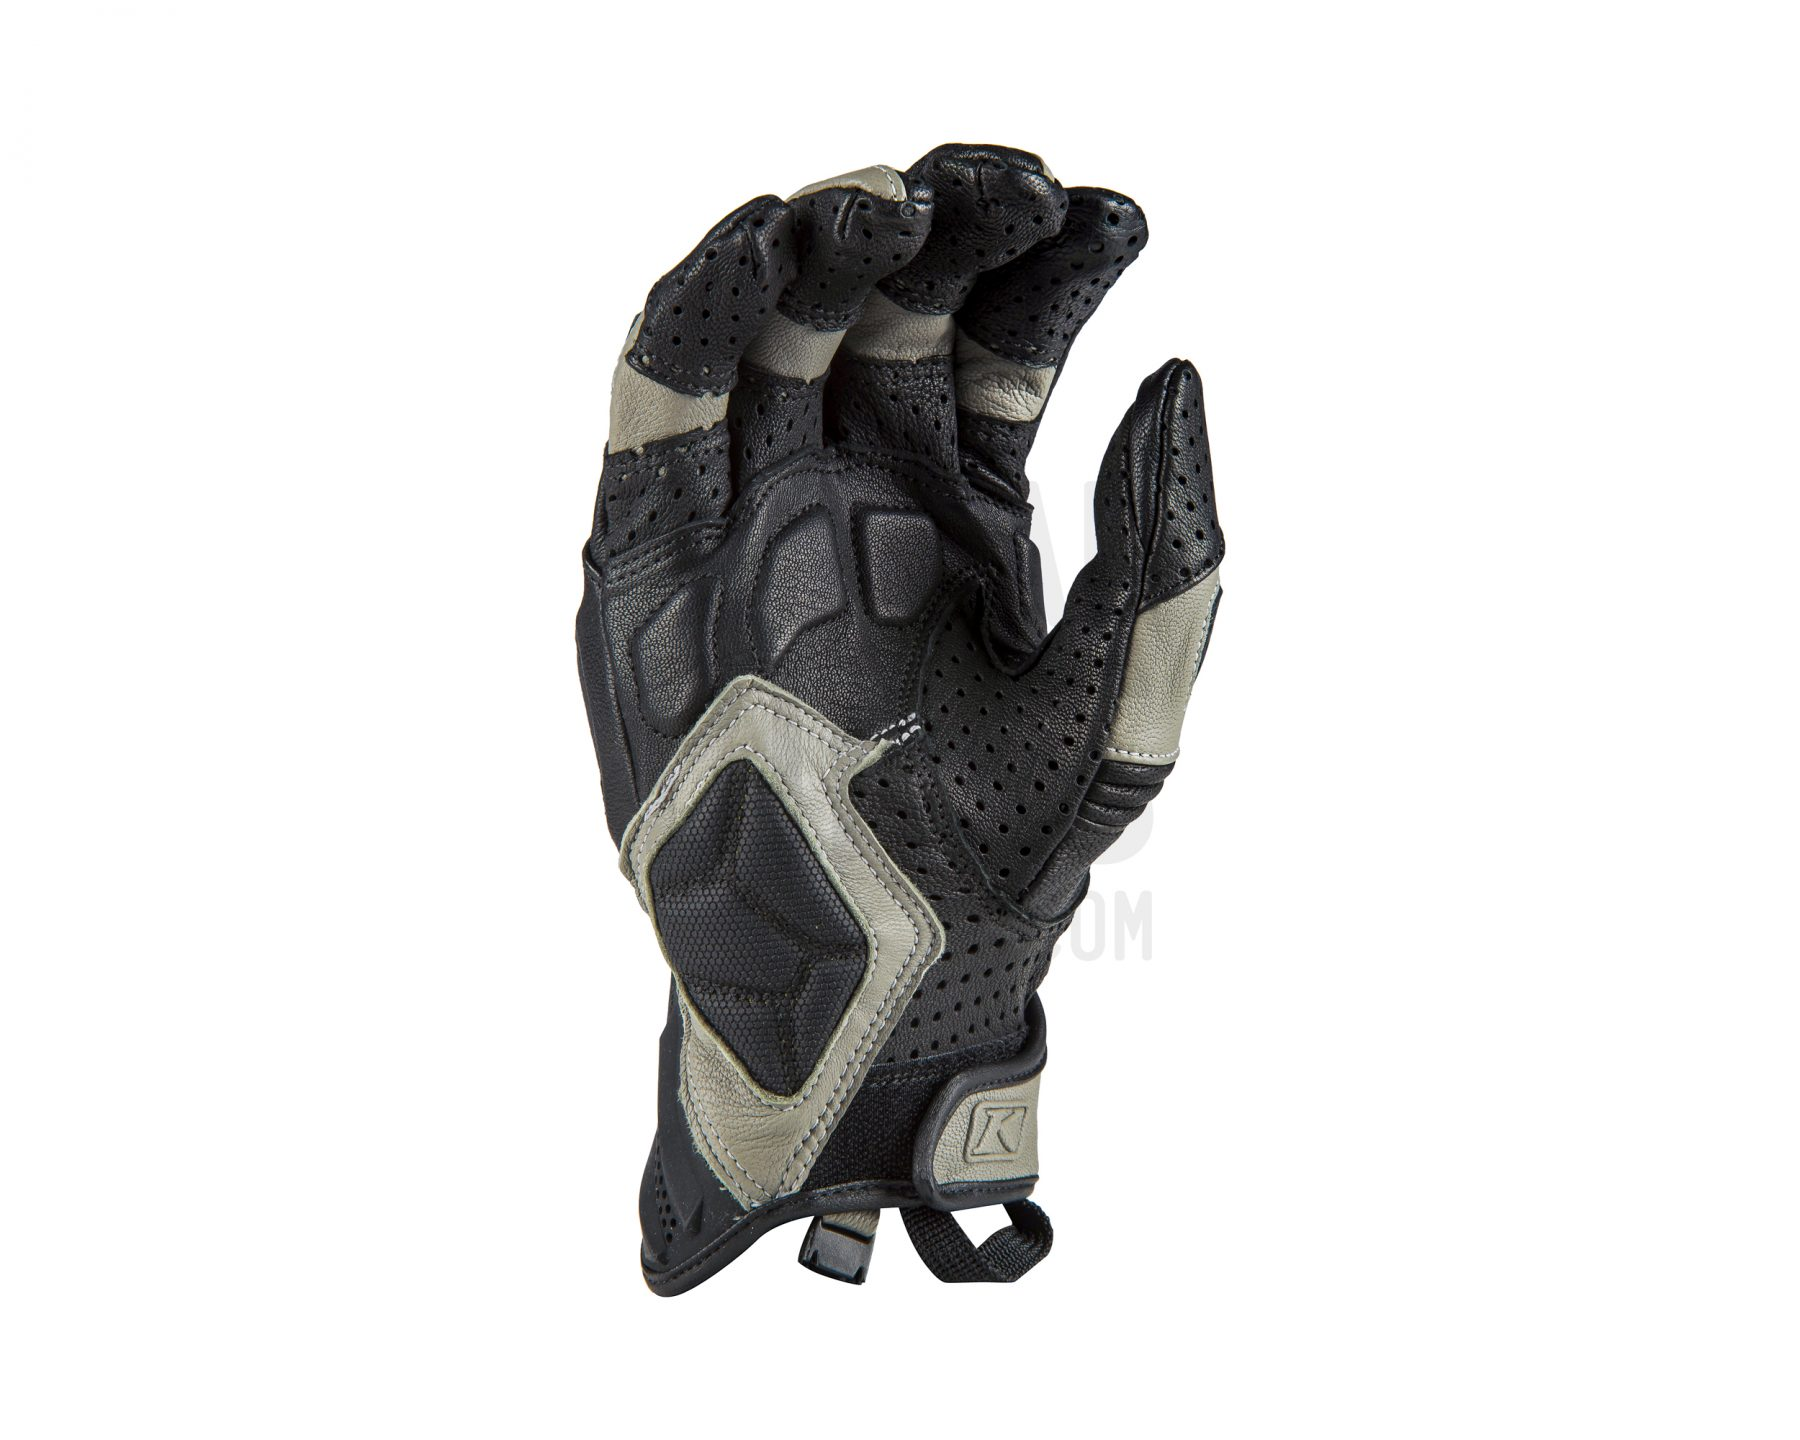 Badlands Aero Pro Short Glove_3924-000_Gray_02